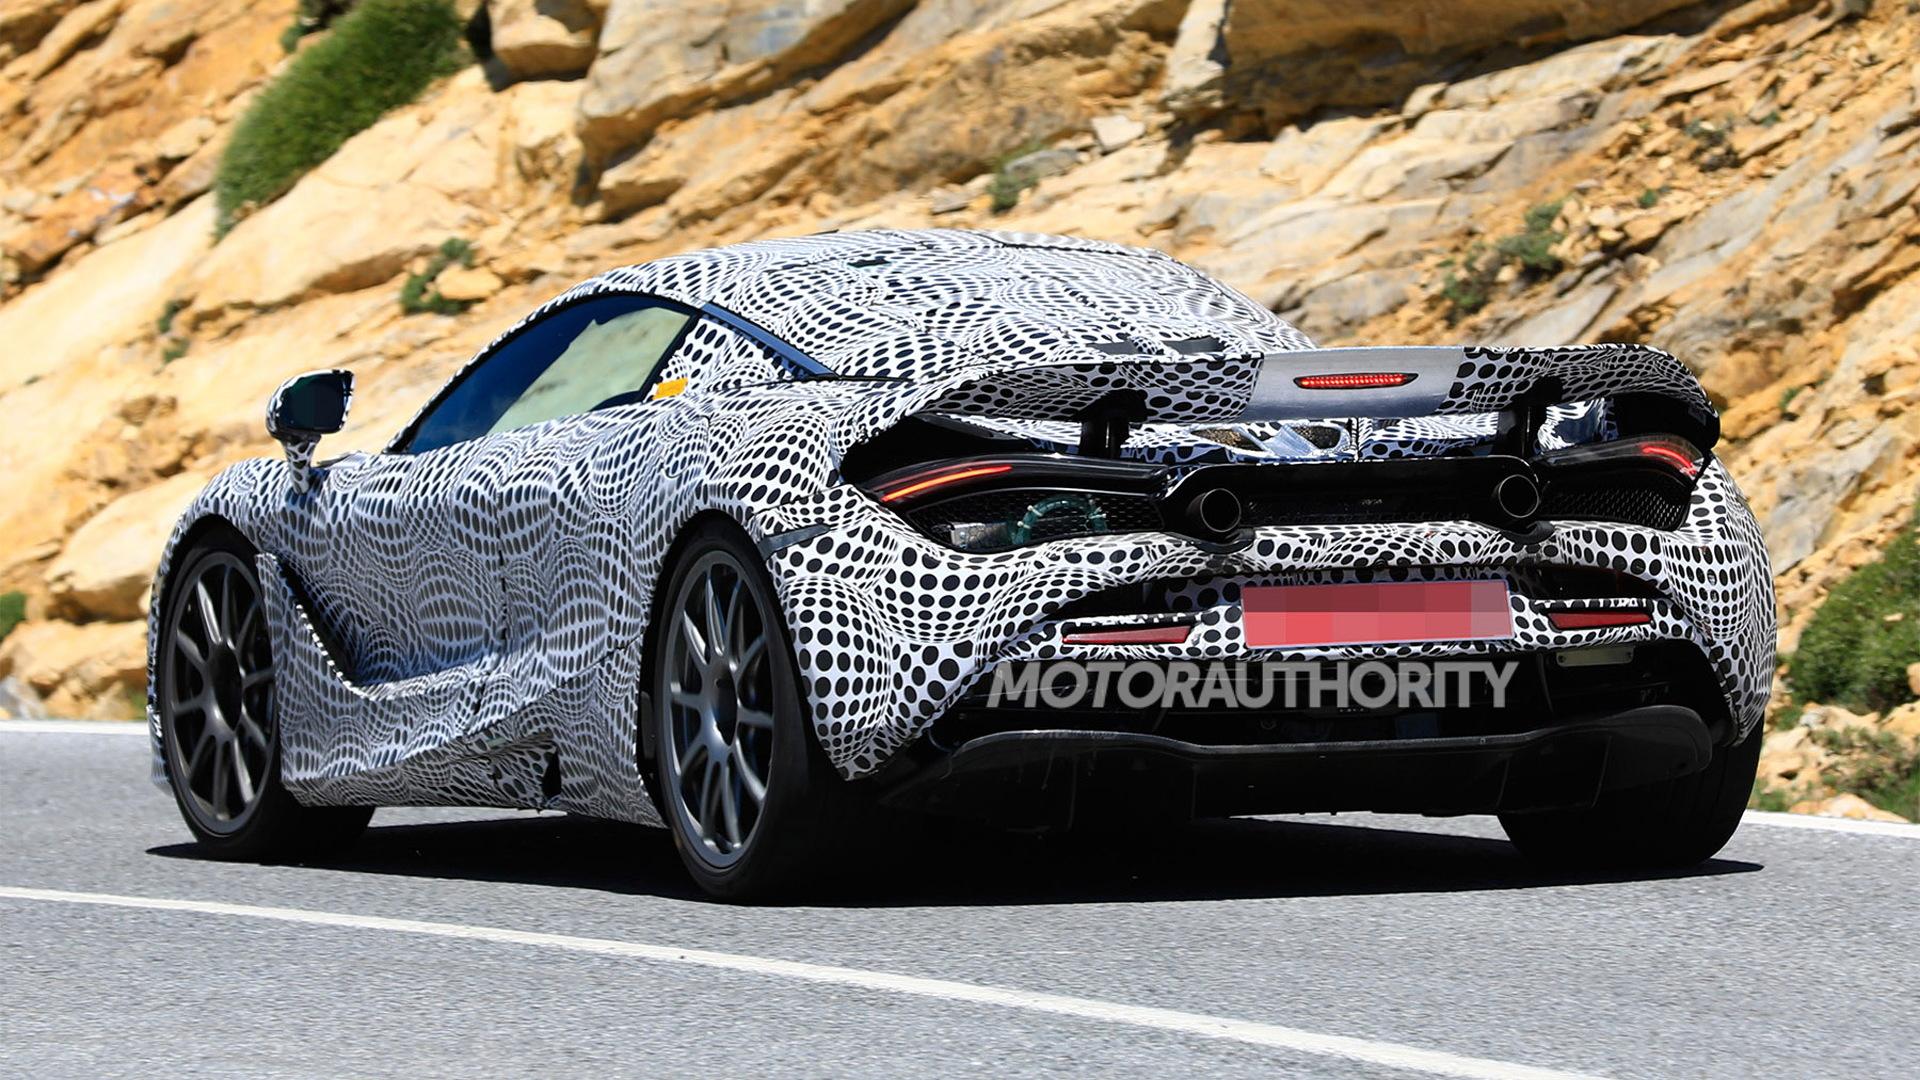 McLaren hybrid test mule spy shots - Image via S. Baldauf/SB-Medien